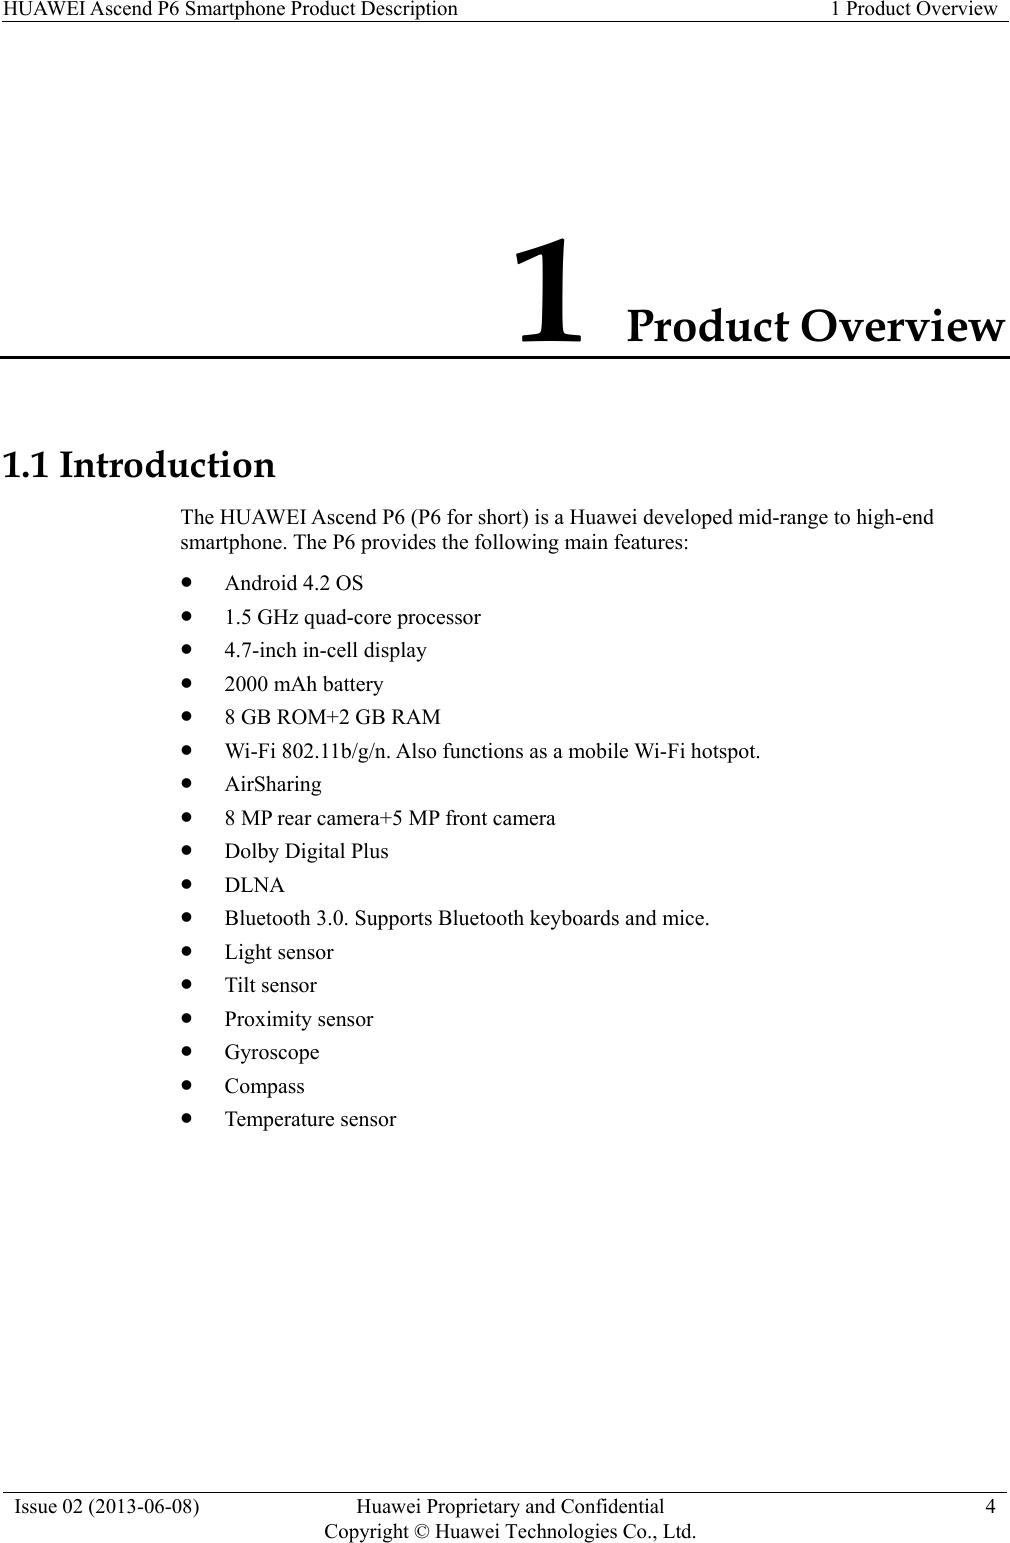 Huawei Ascend P6 U06 Smartphone Product Description